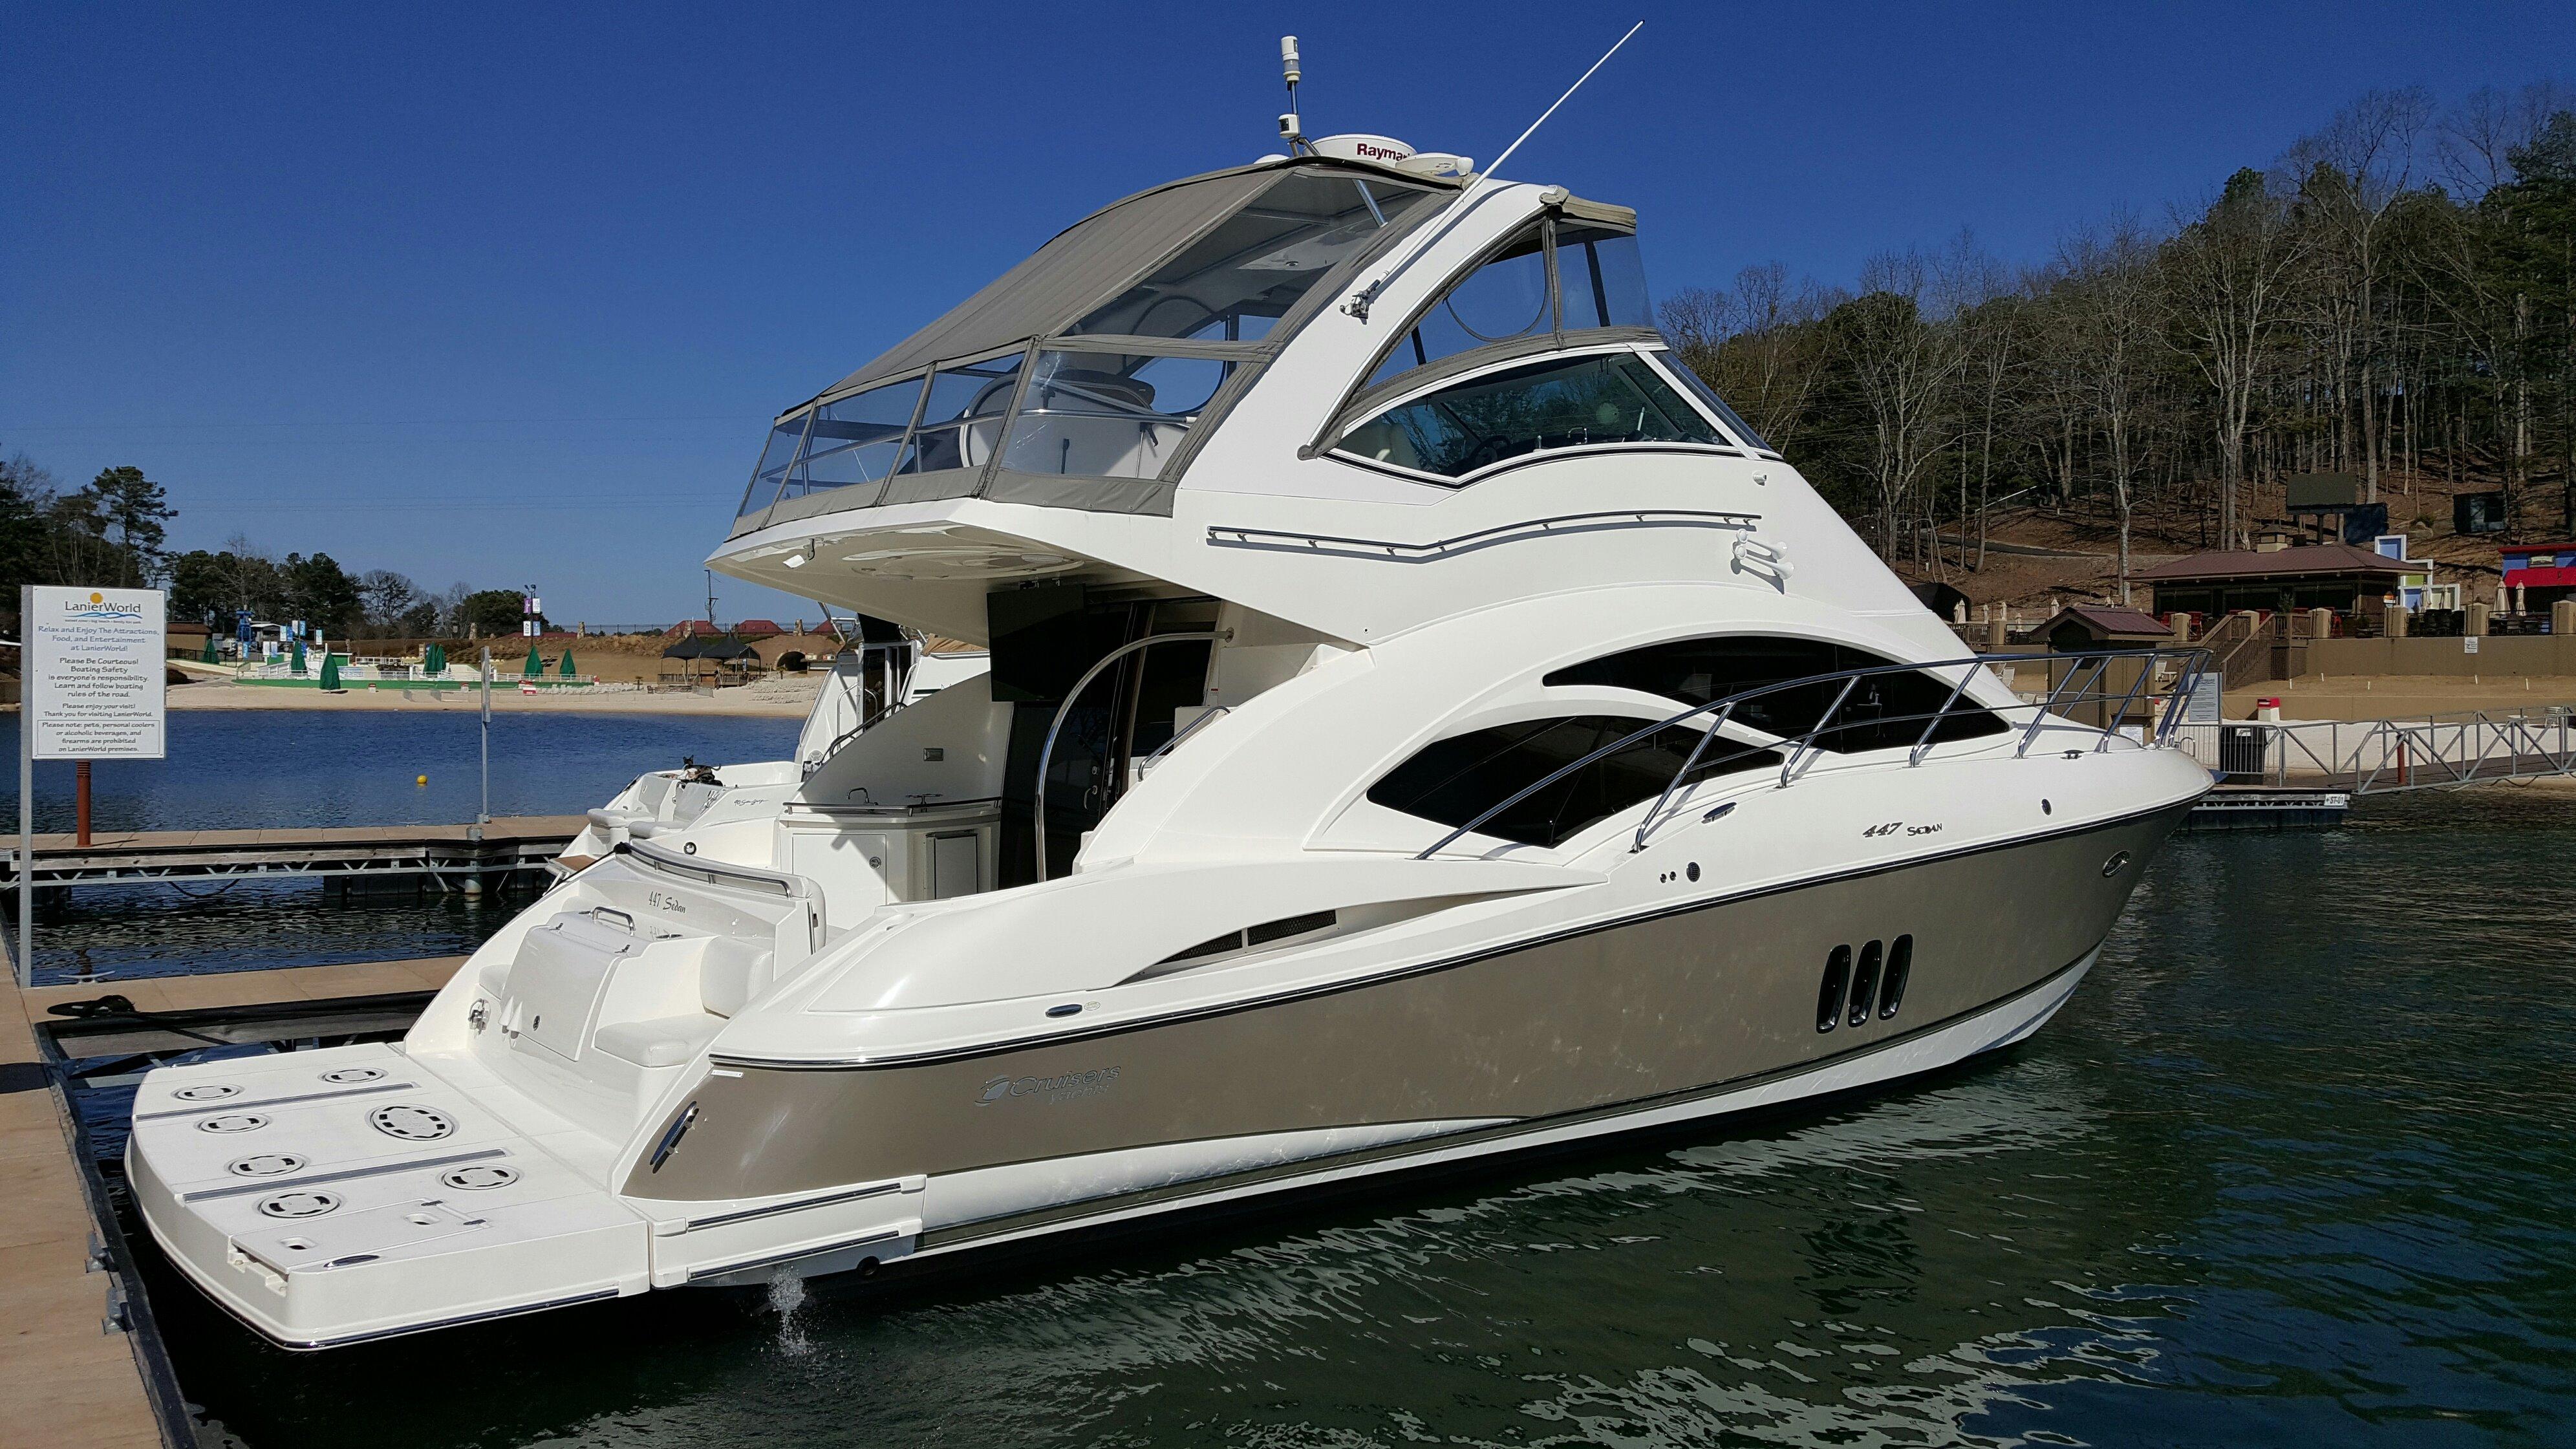 Used 2008 Cruisers Yachts 447 Sport Sedan, Buford, Ga - 30518 ...